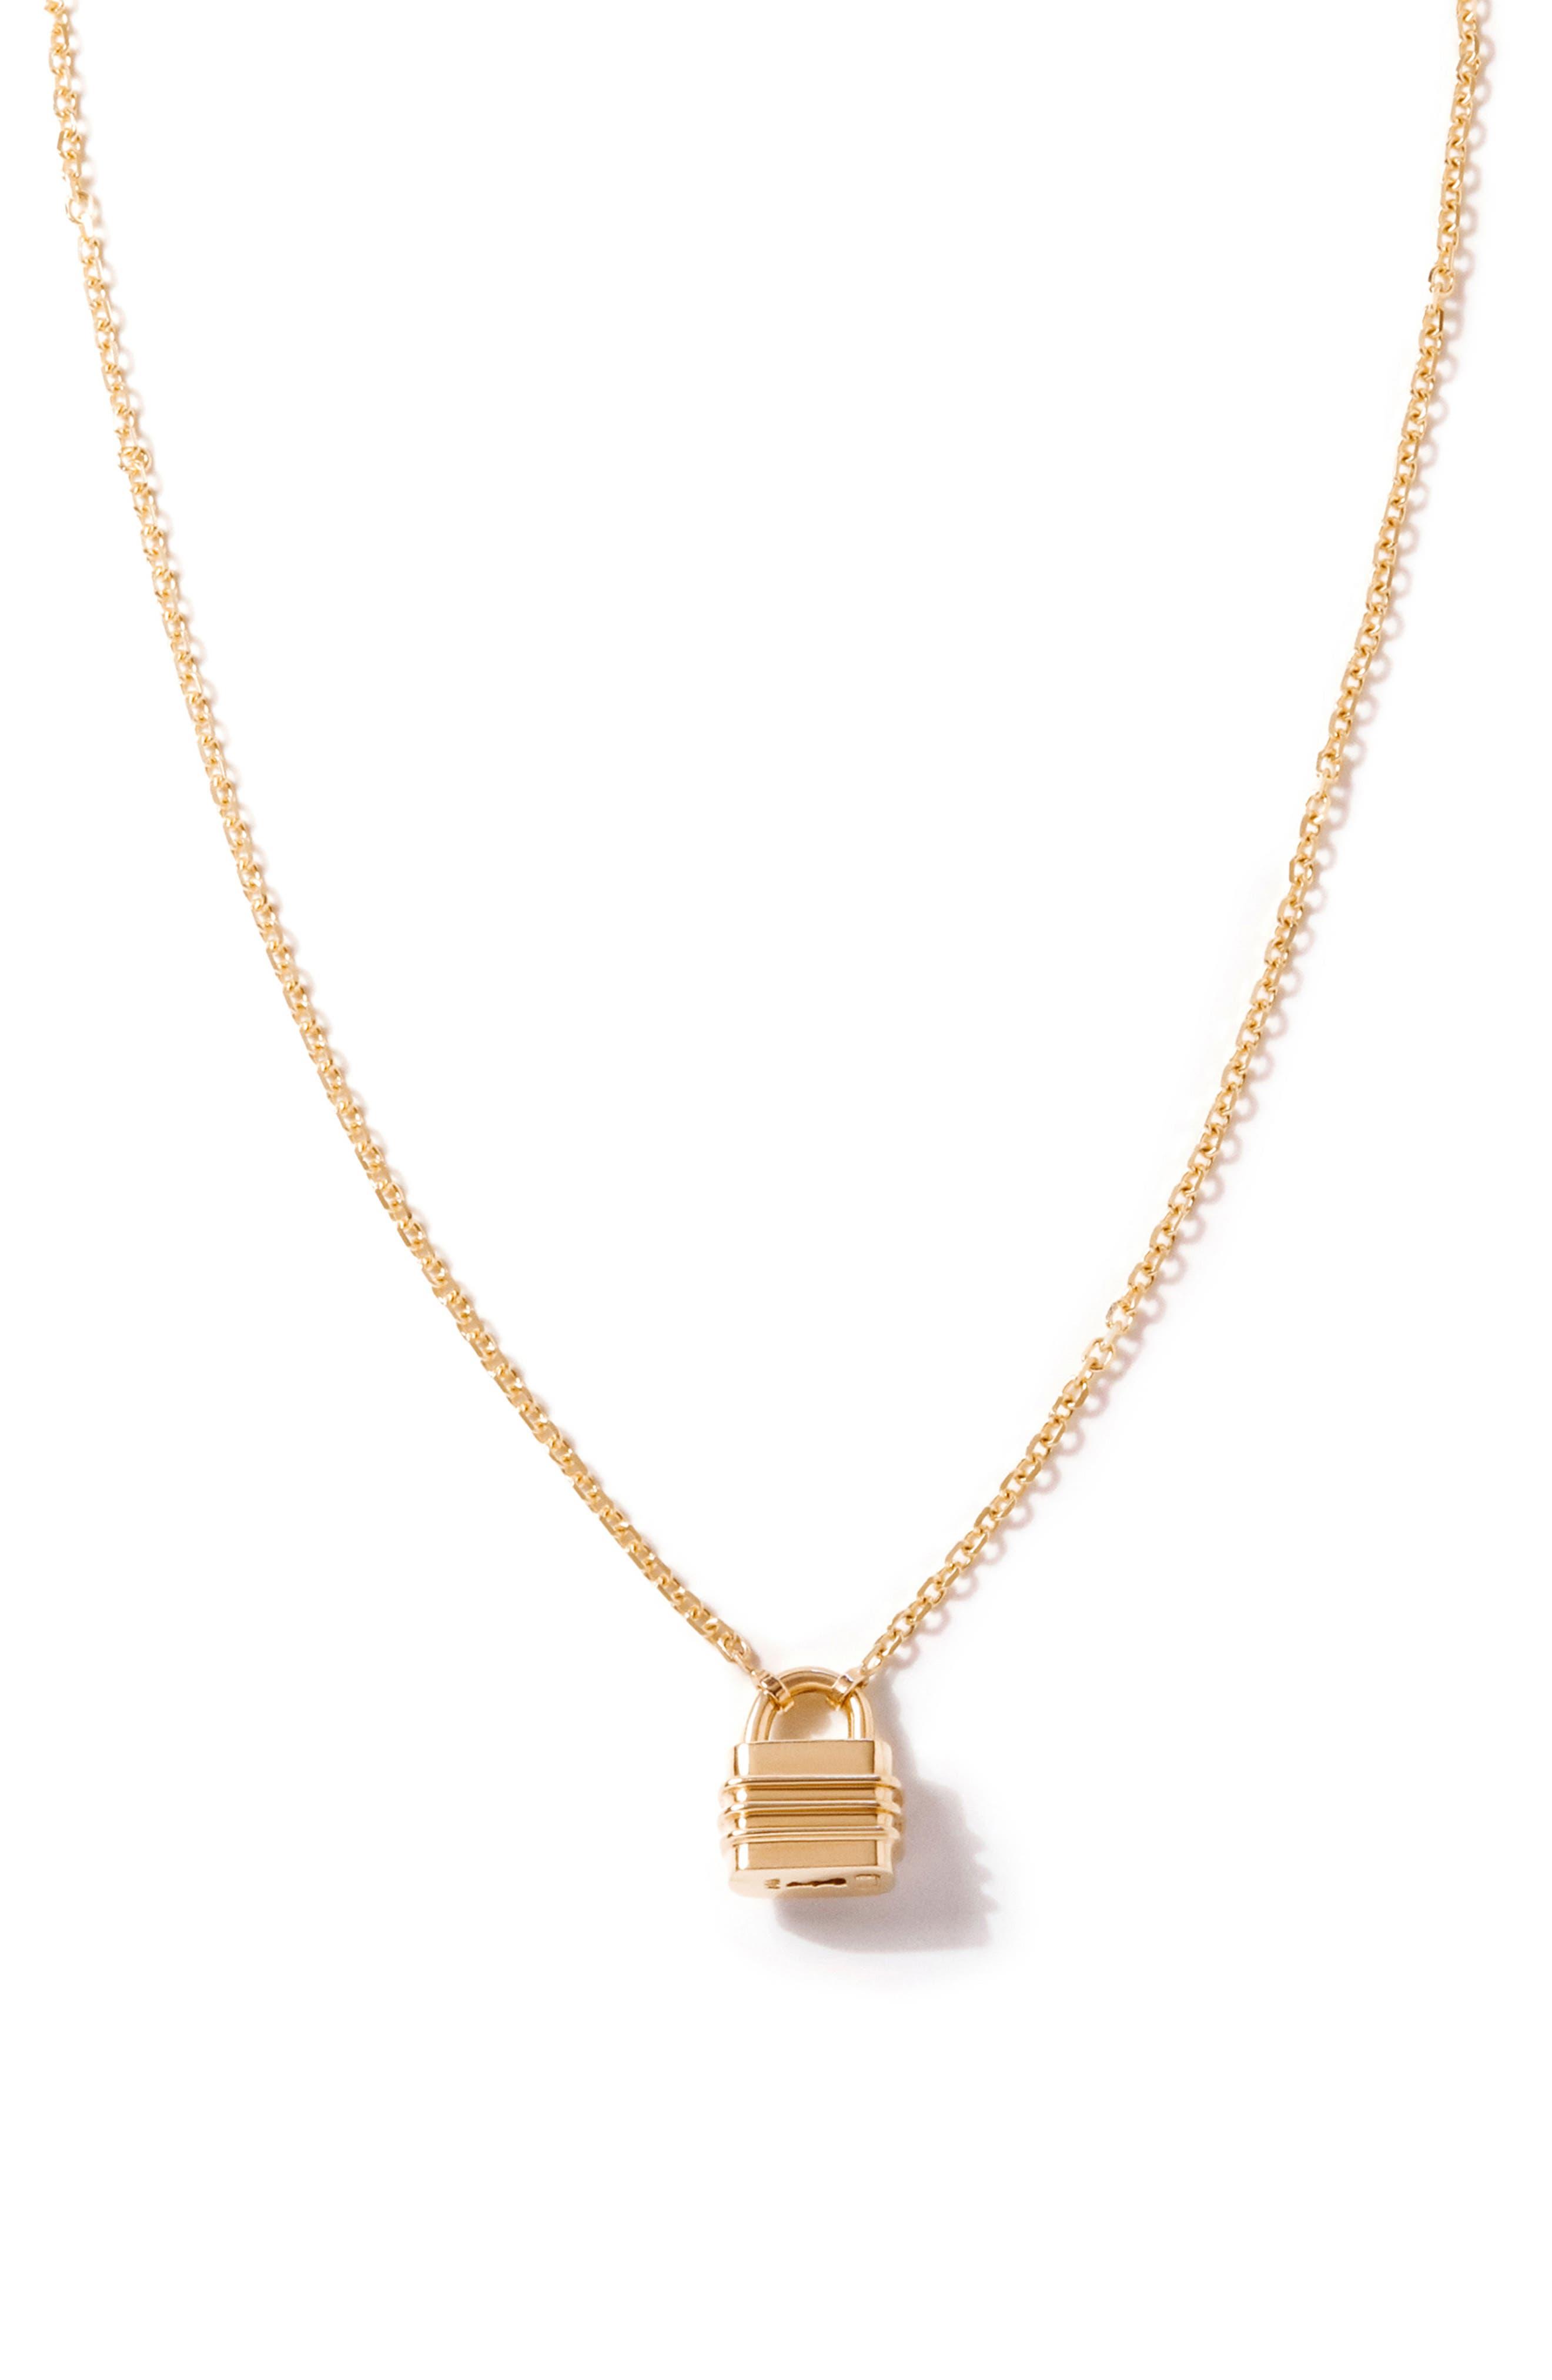 Liberte 14K Gold Pendant Necklace/charm Bracelet